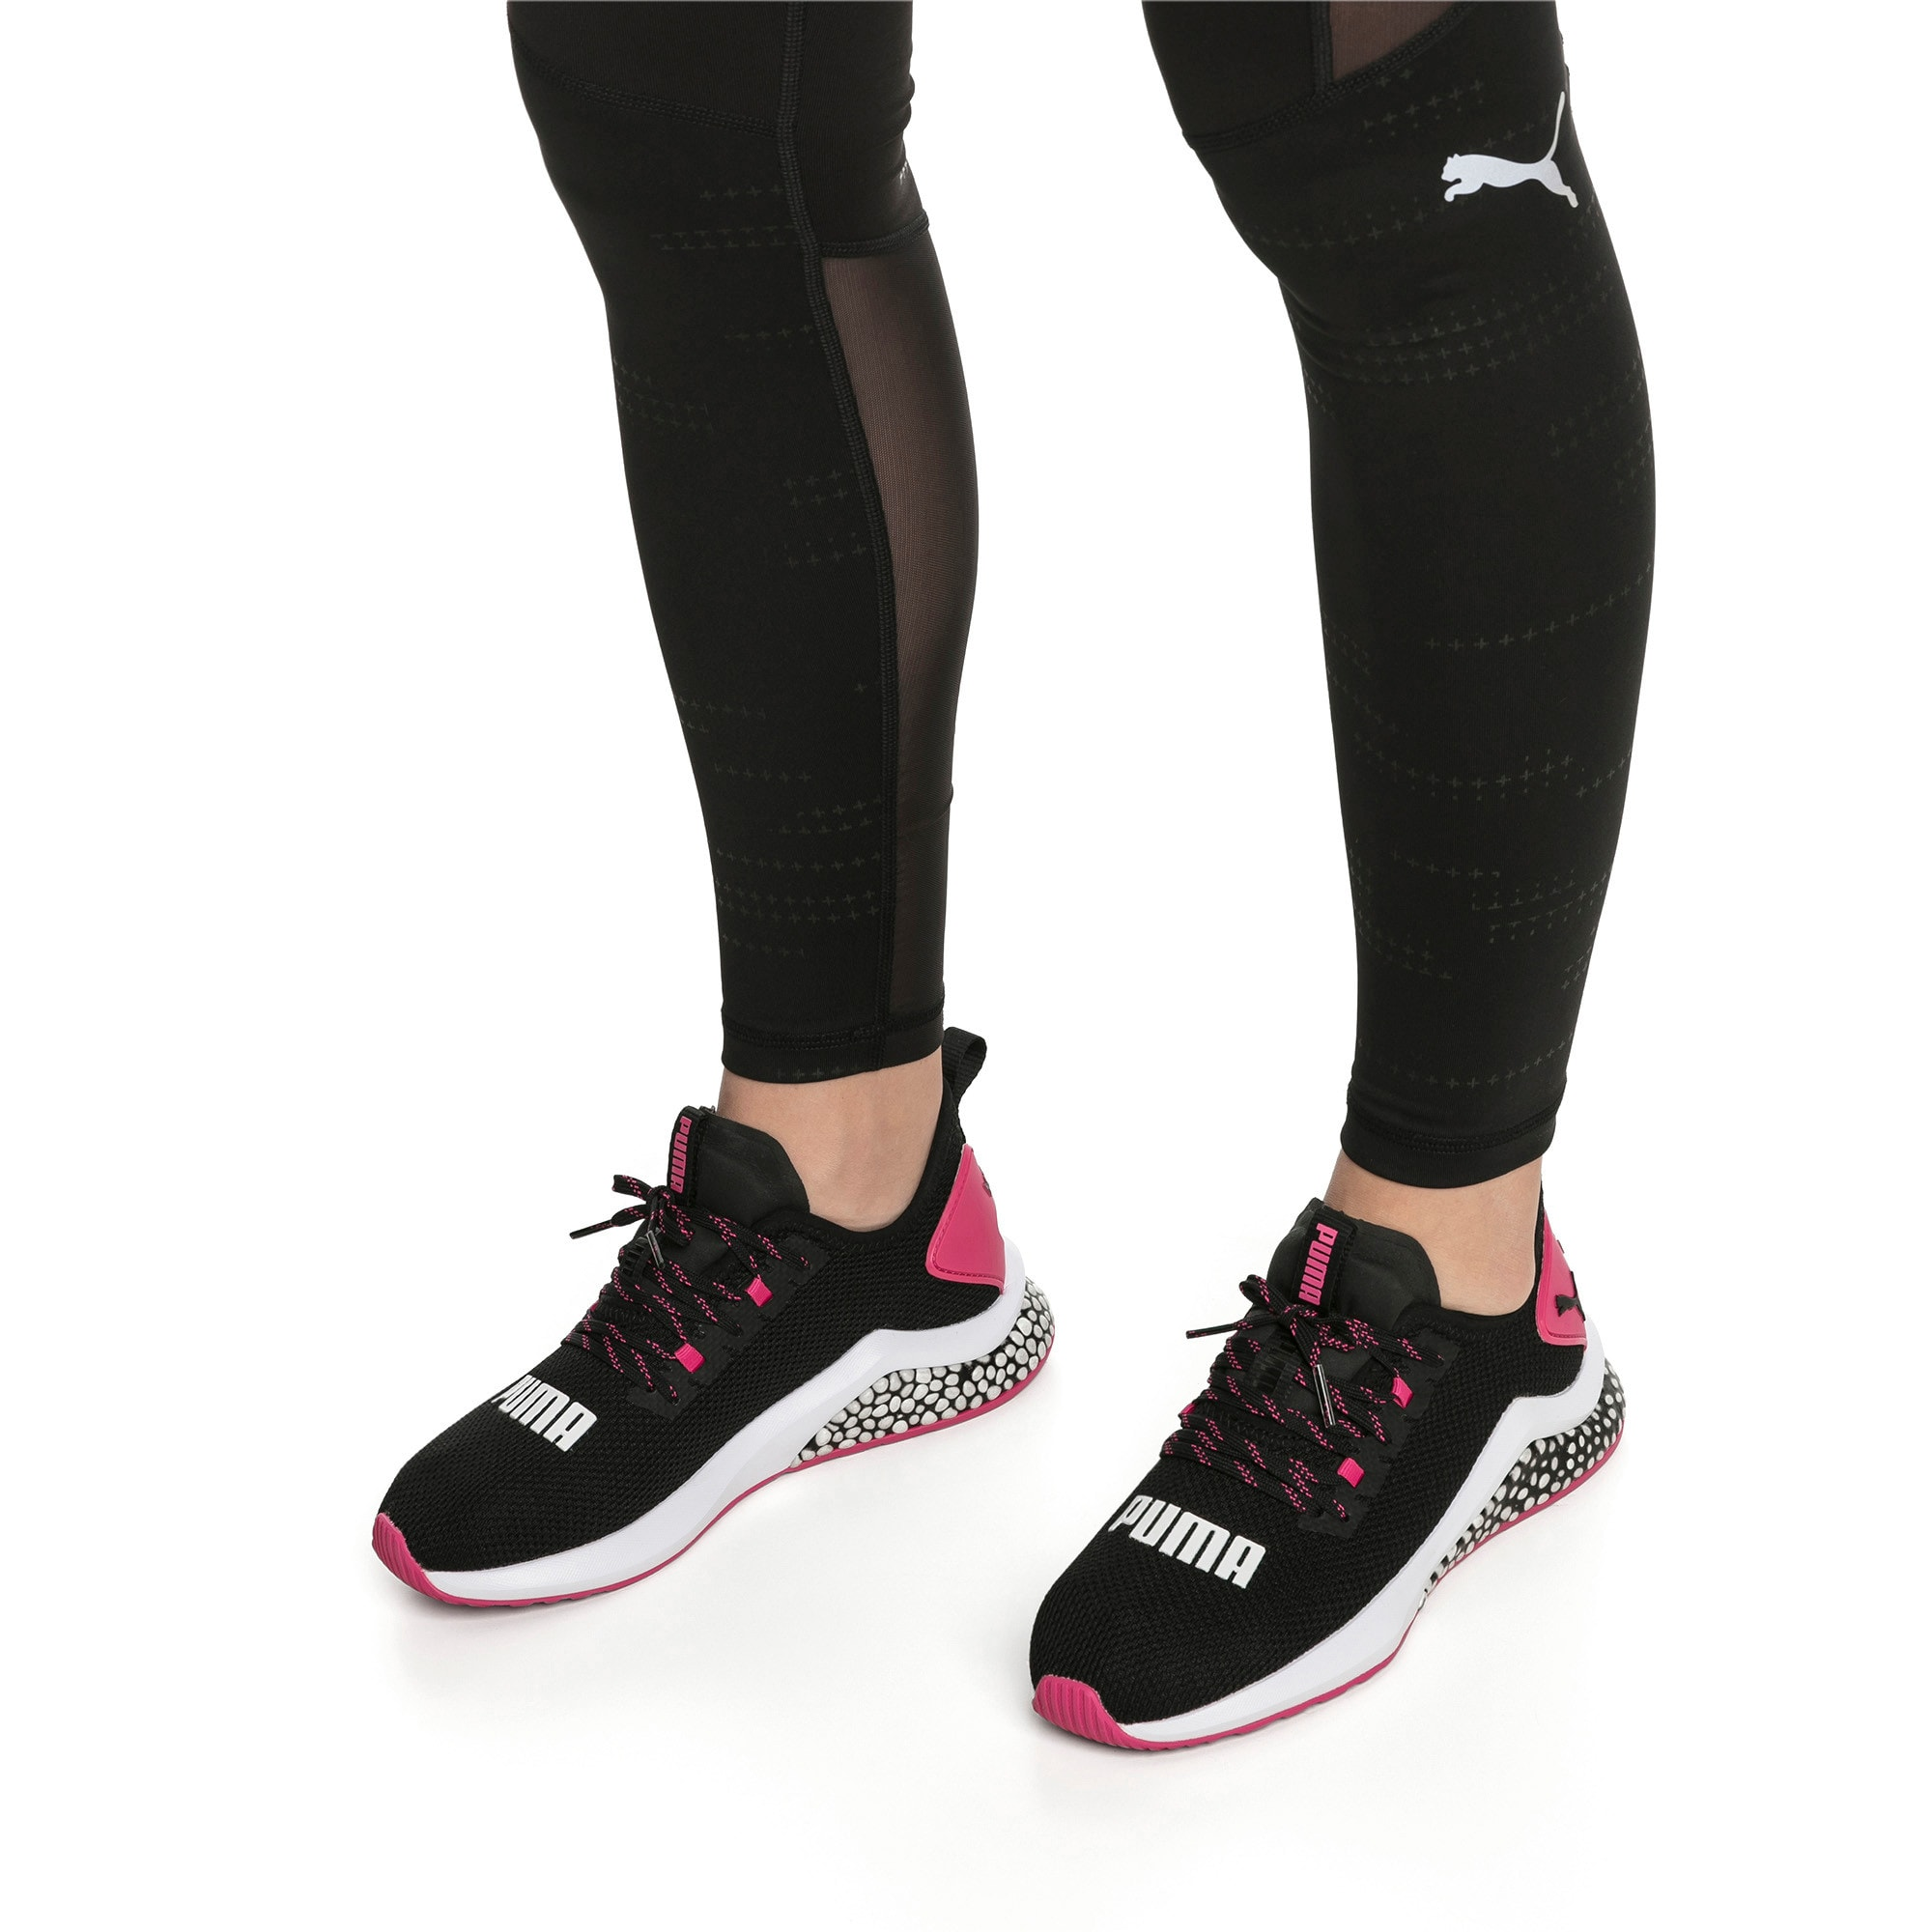 Miniatura 2 de Zapatos para correr HYBRID NX para mujer, Puma Black-Fuchsia Purple, mediano